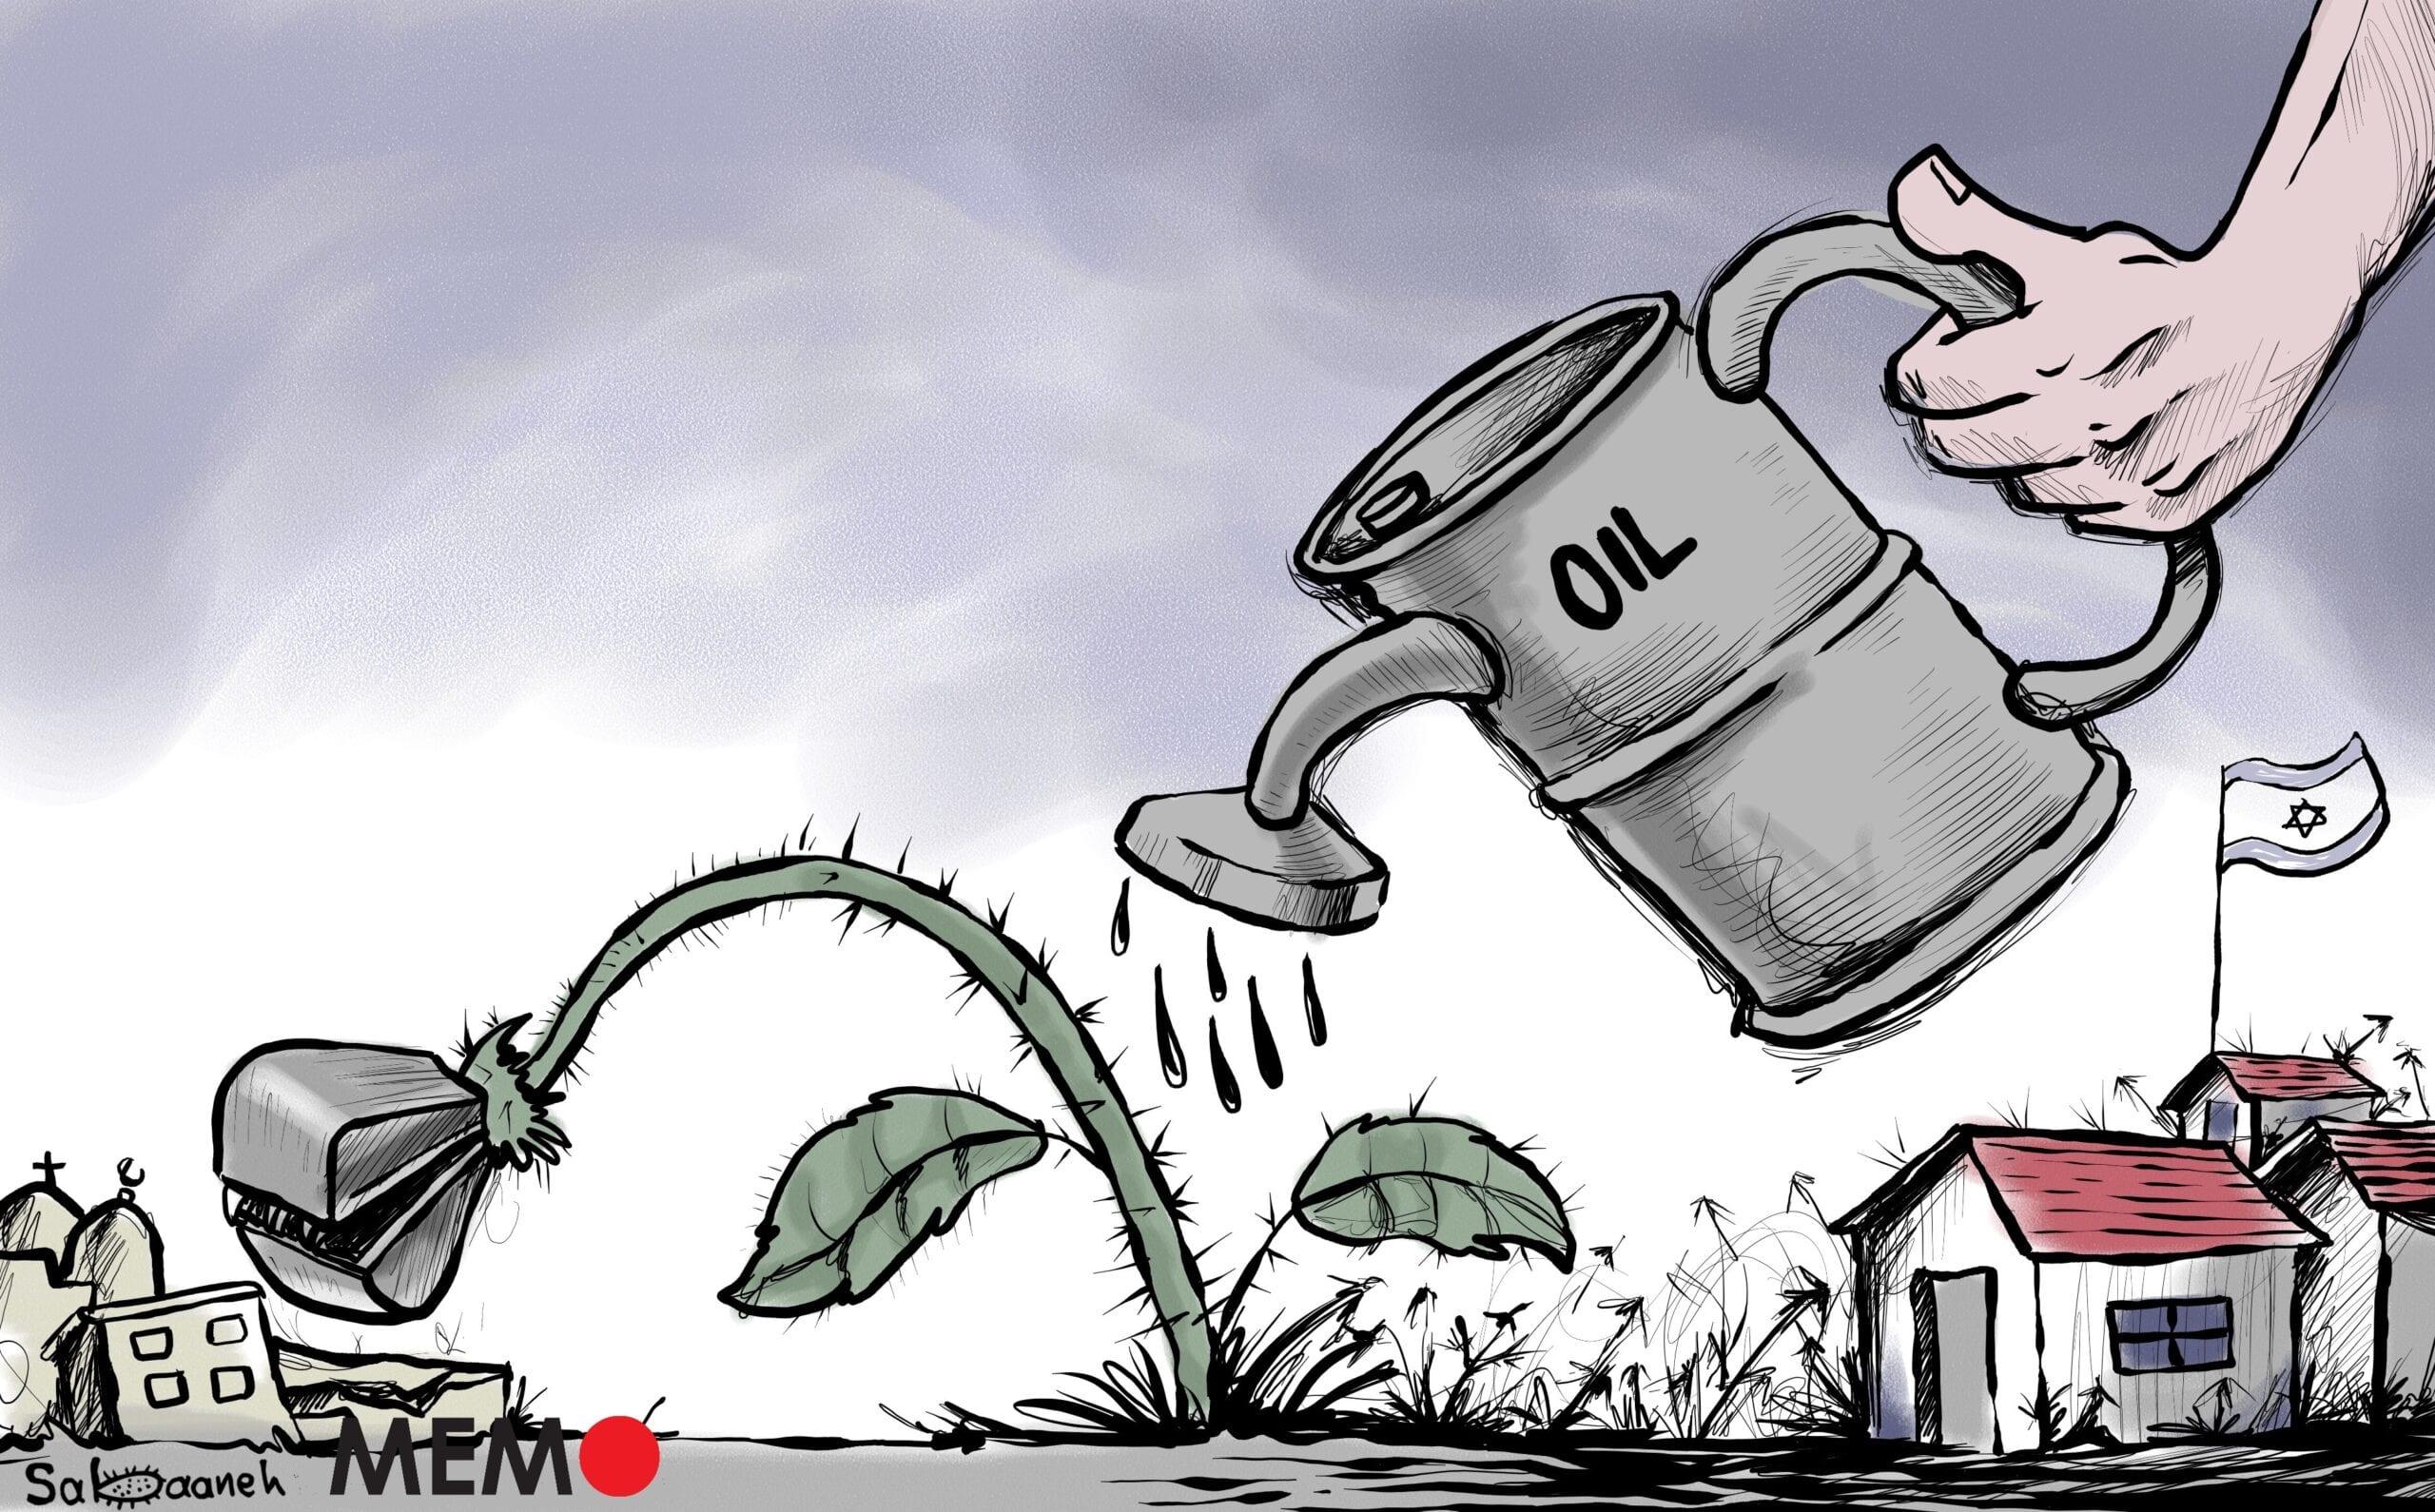 Is oil financing Israel's settlement expansion? - Cartoon [Sabaaneh/MiddleEastMonitor]